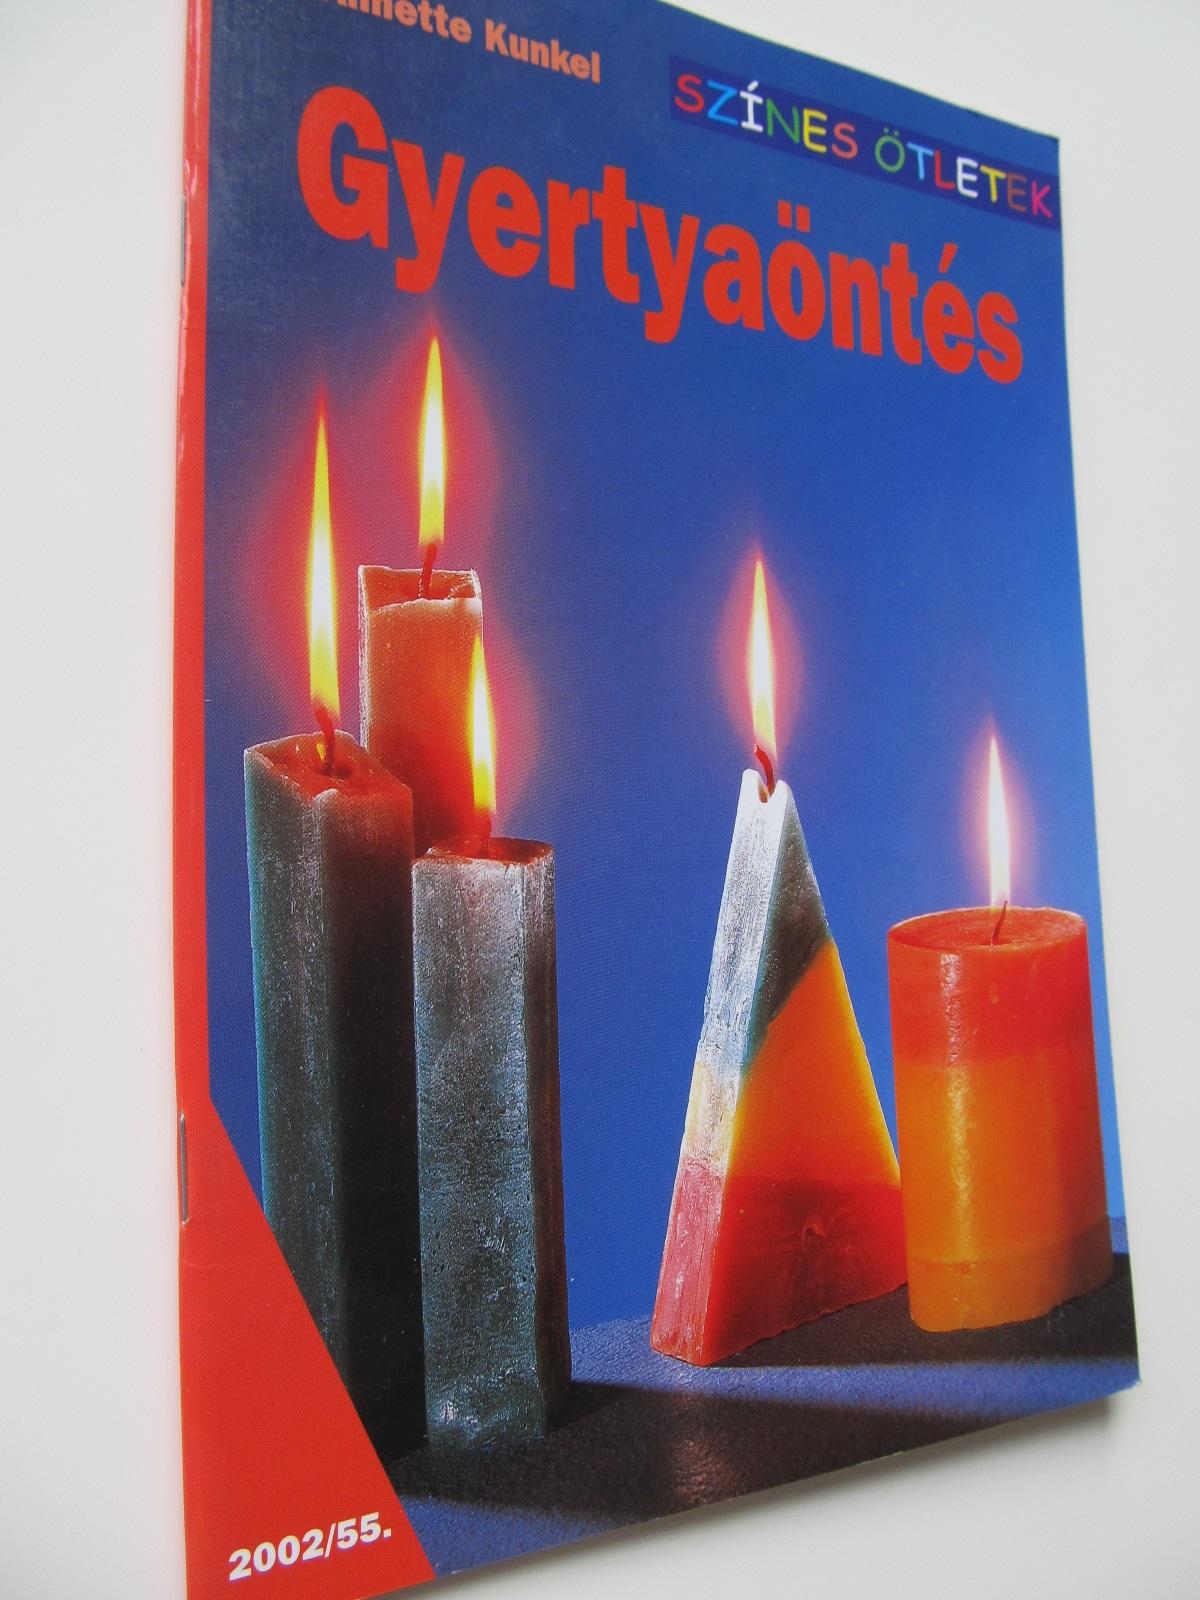 Gyertyaontes (Turnarea lumanarilor) - Annette Kunkel | Detalii carte